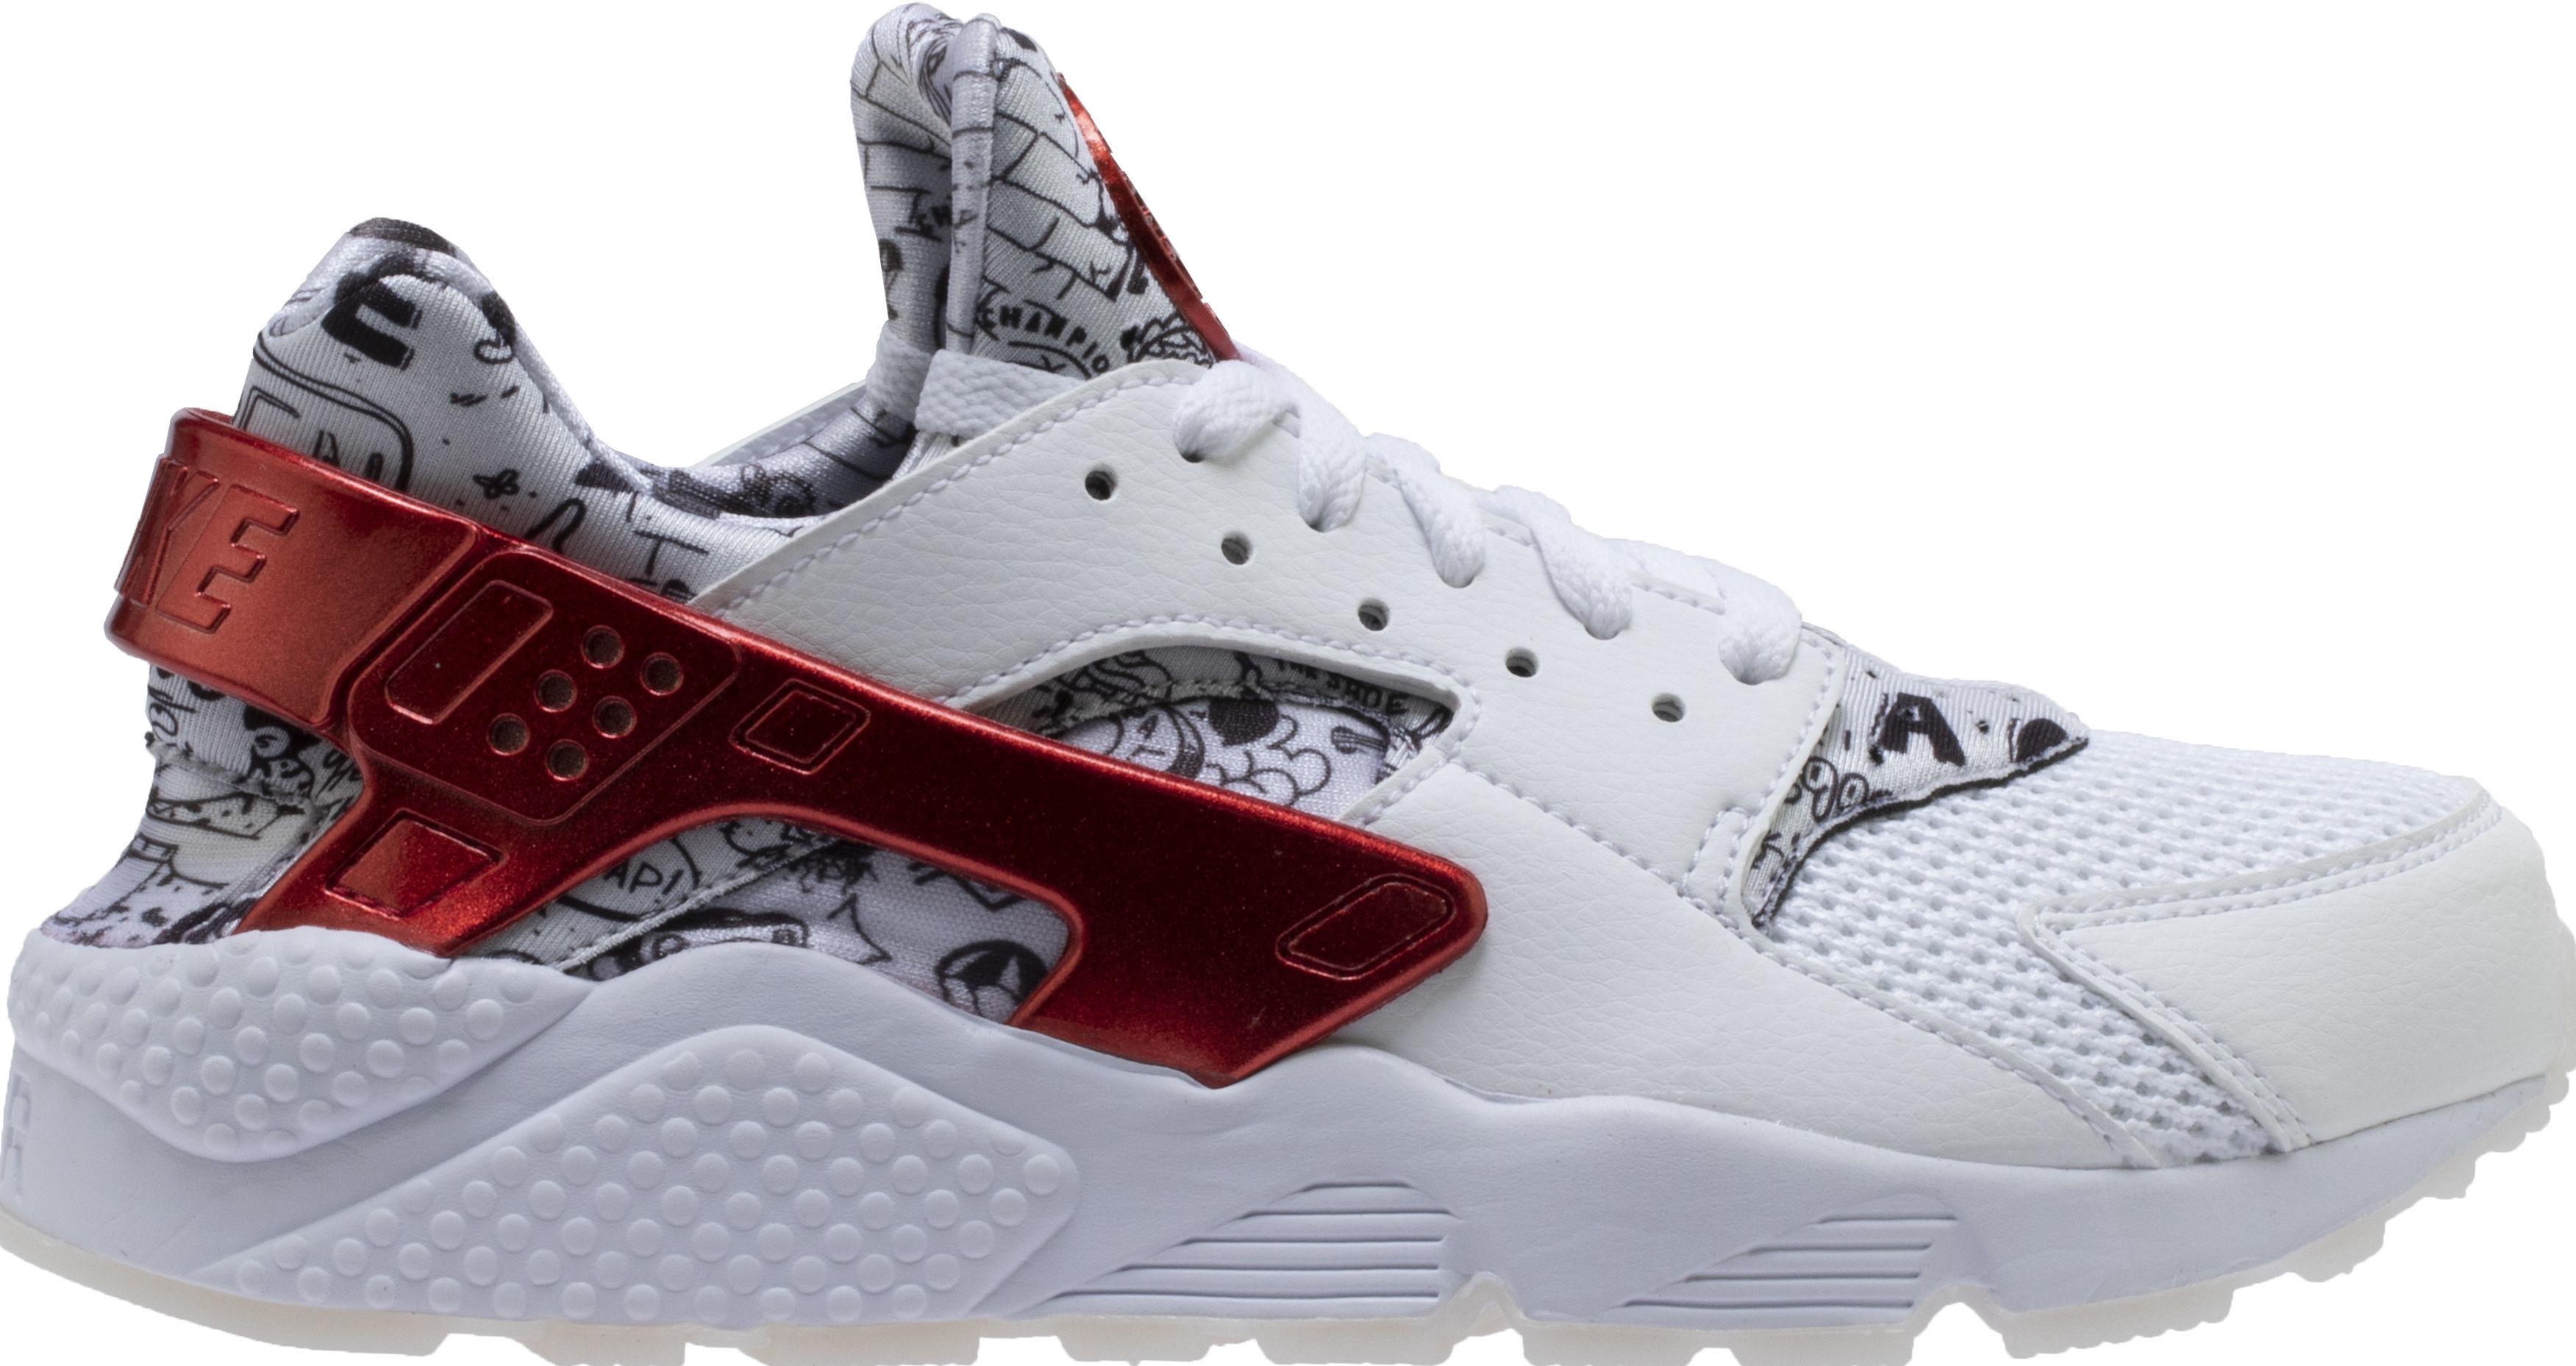 a45cf021c1978 Shoe Palace x Nike Air Huarache White Red Platinum  Joonbug  AJ5578-101  Release Date